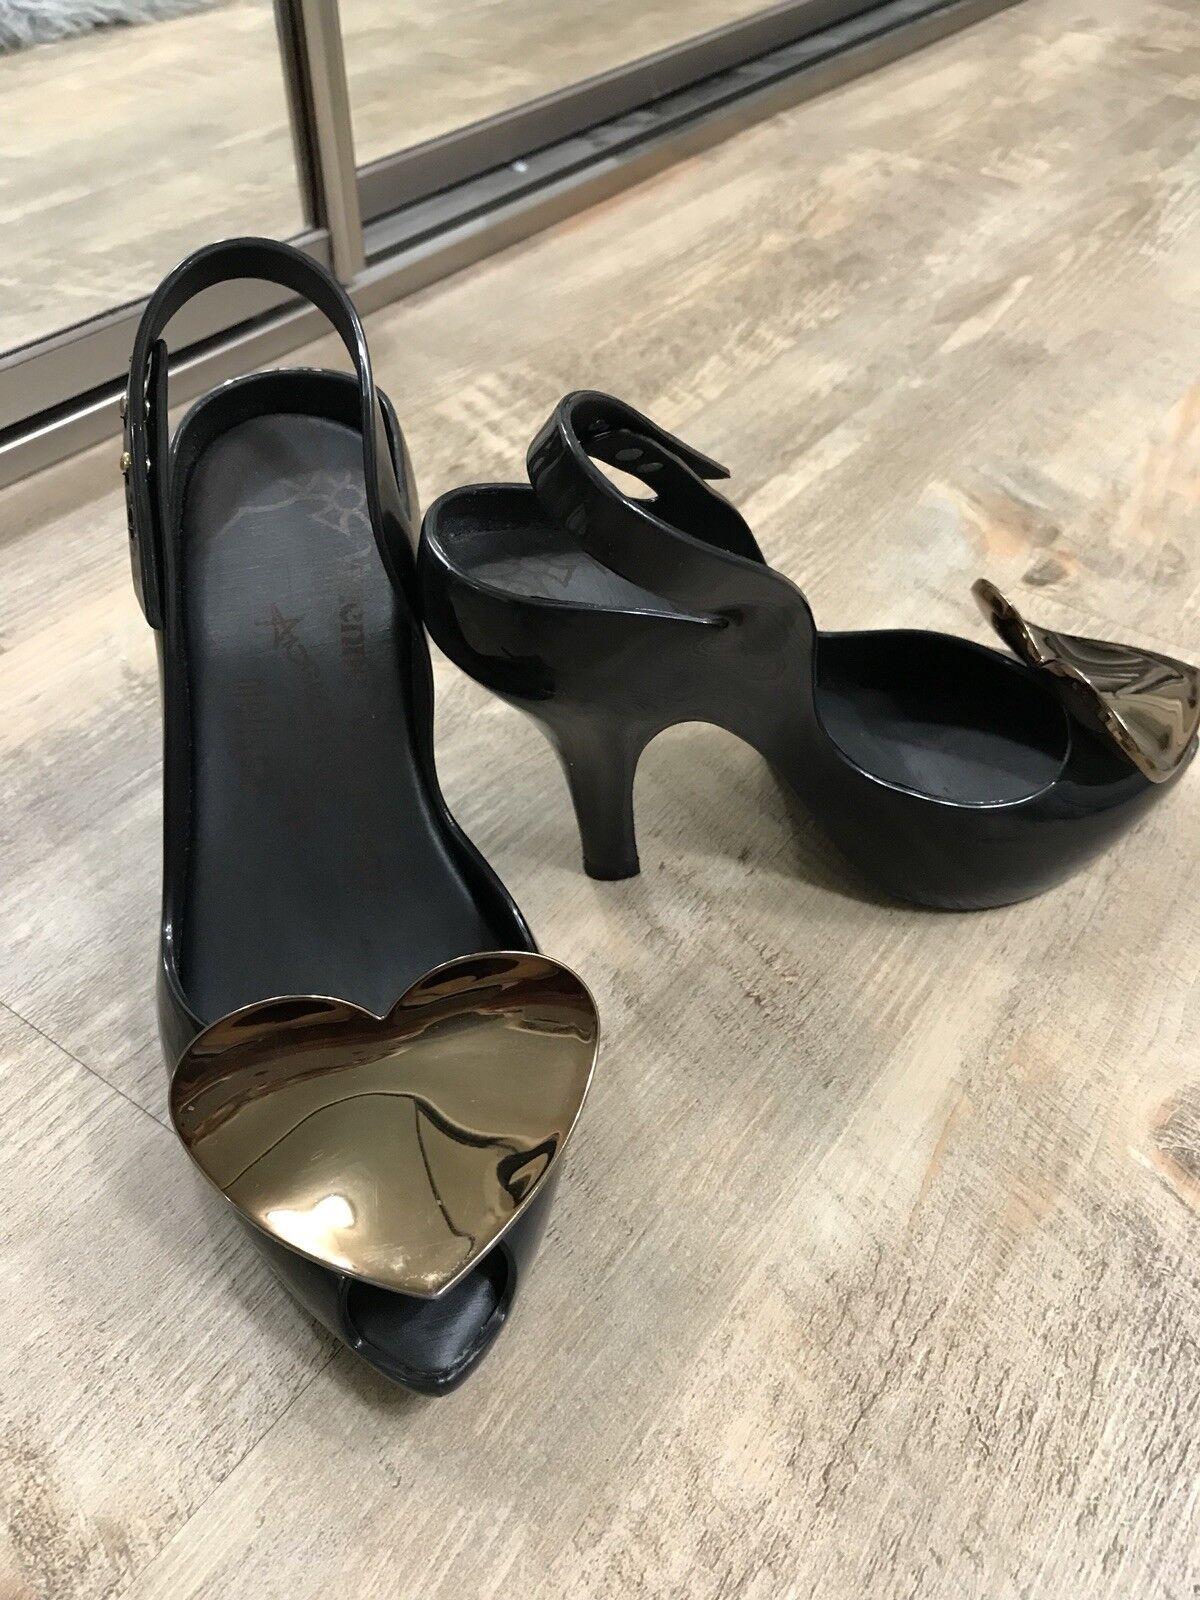 Vivienne Westwood Anglomania Pour Melissa VW Lady Dragon Bow II, chrome noir